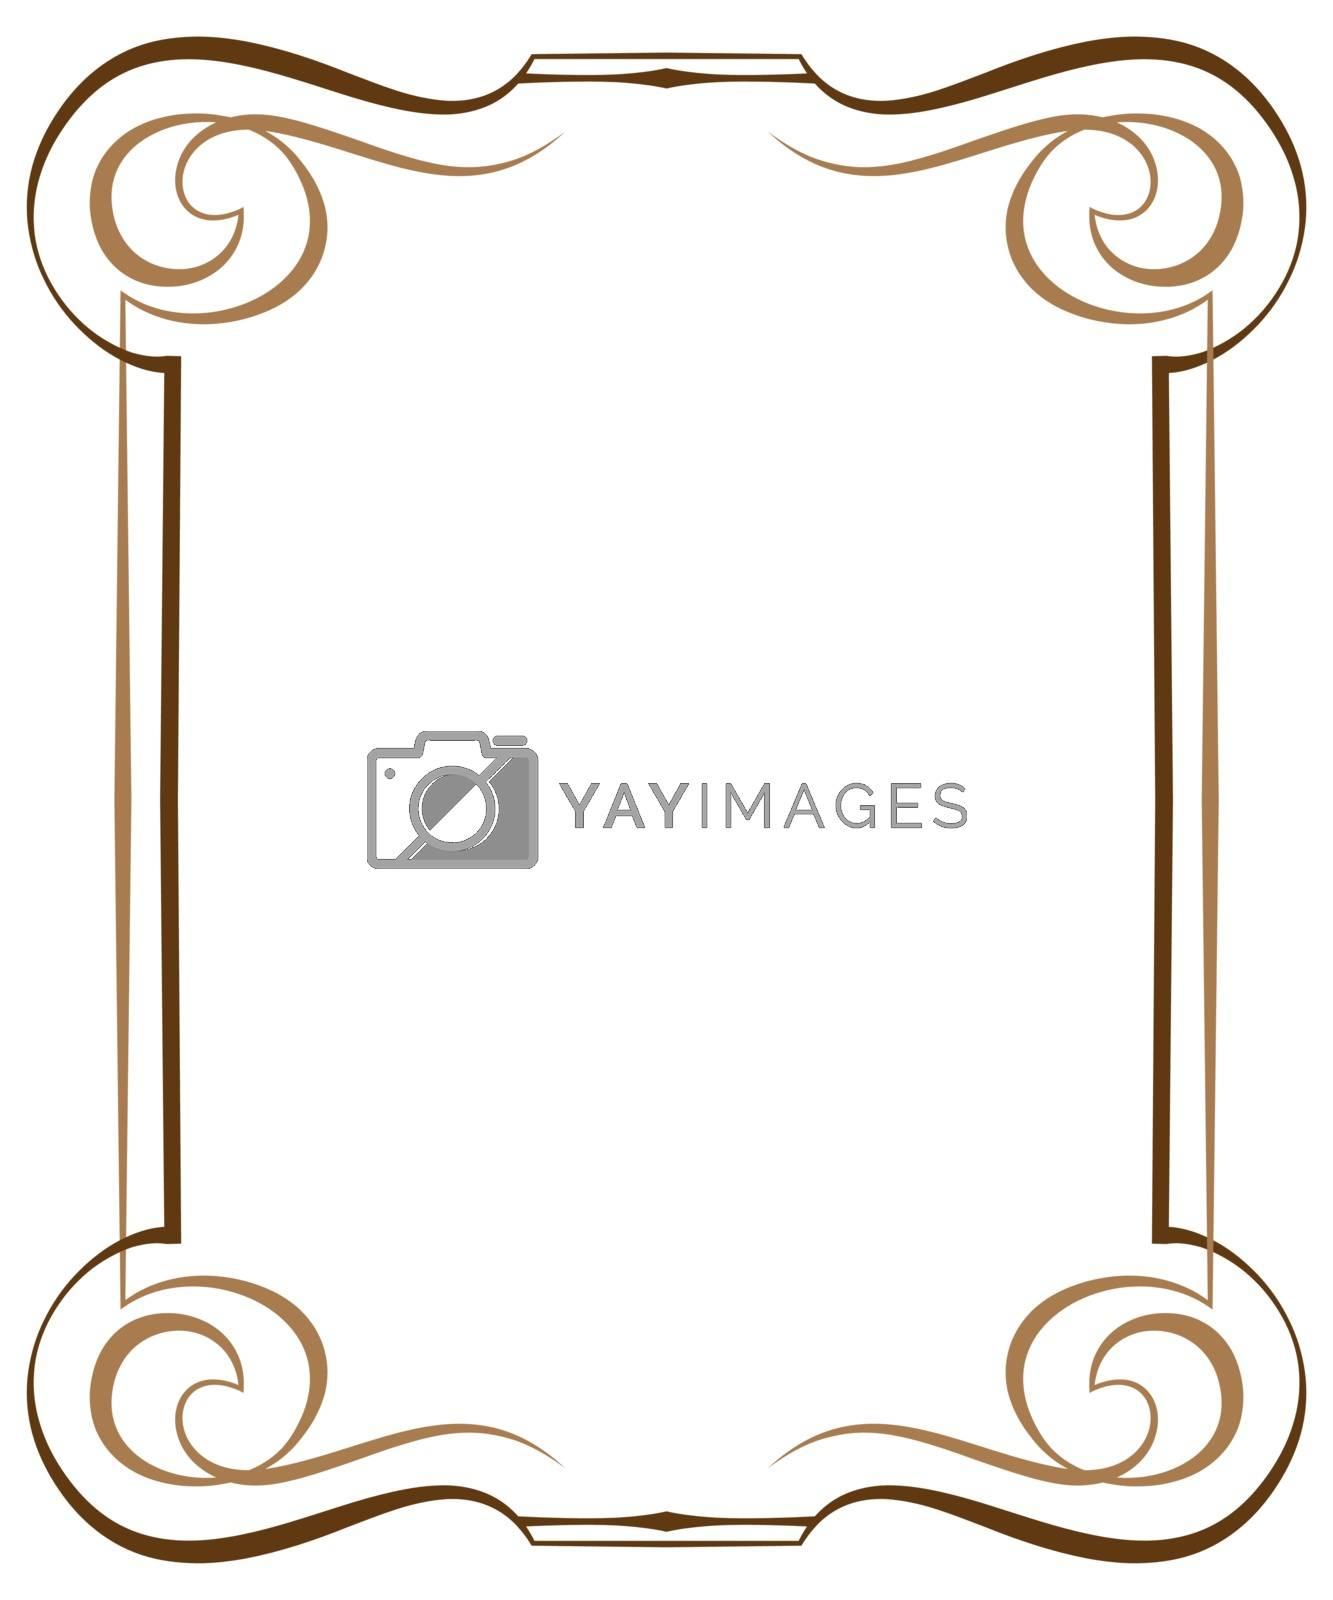 Vintage brawn multilayer vertical vector frame with swirls